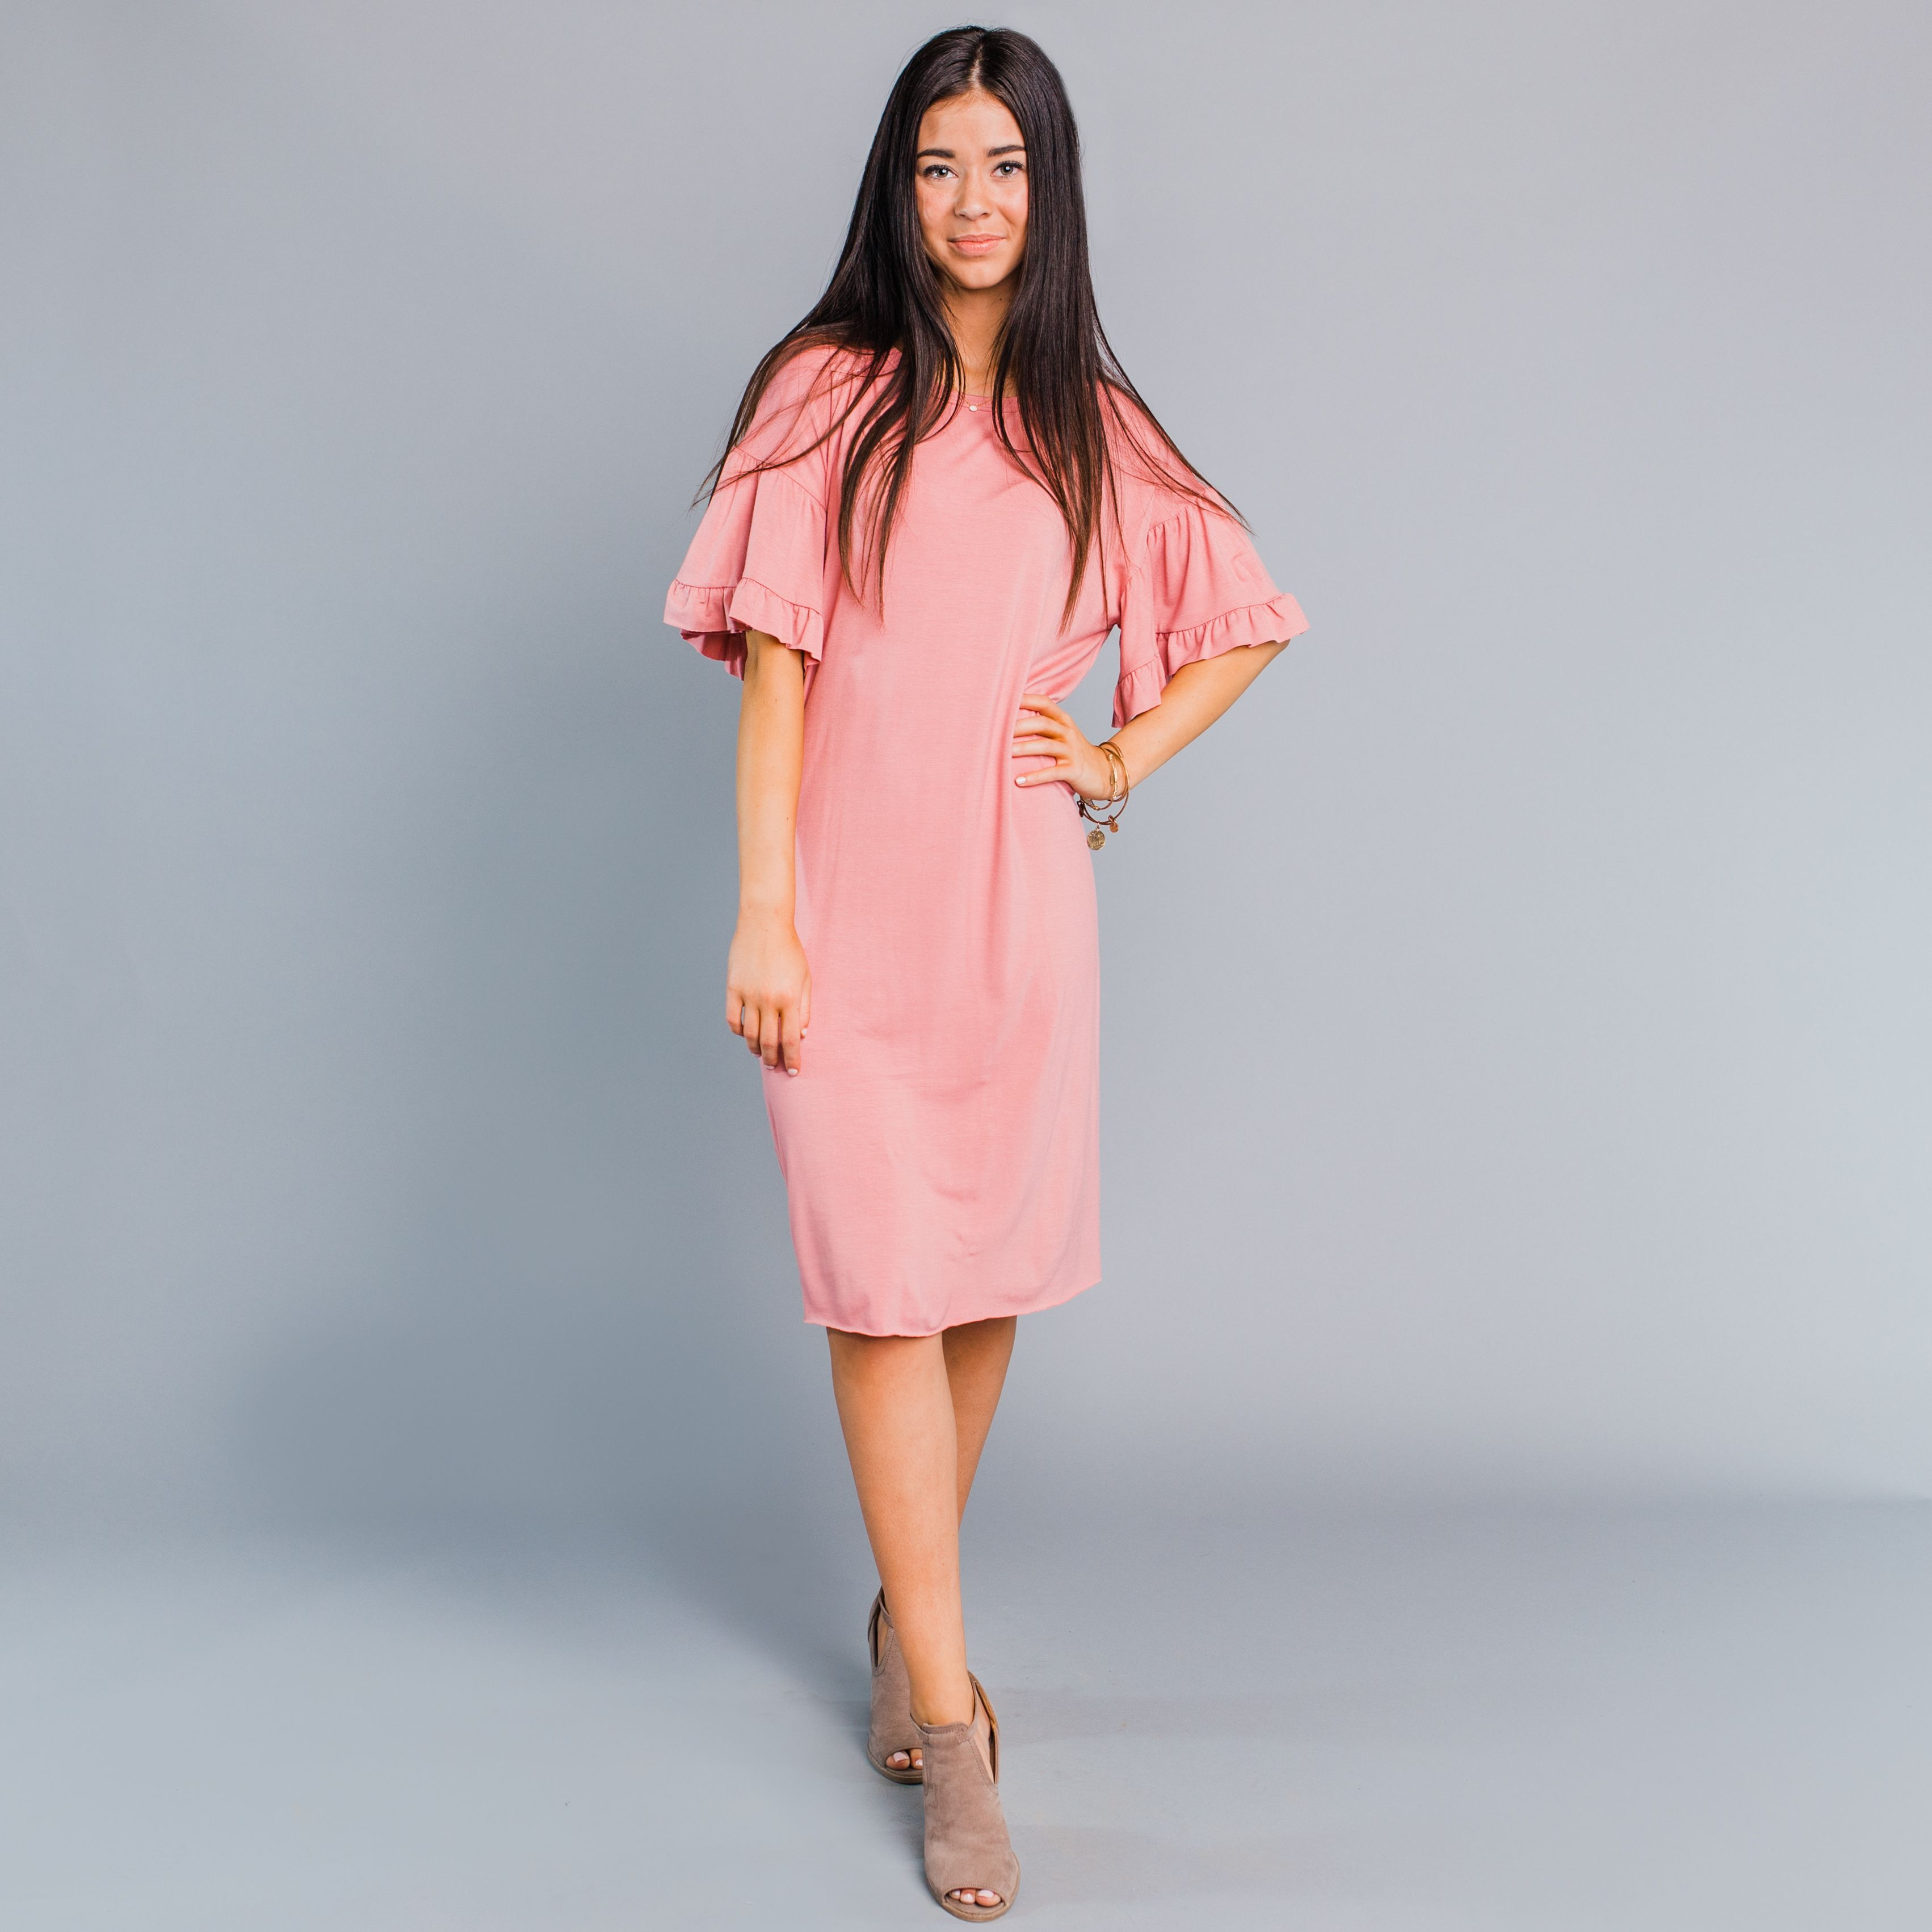 Peach dress for wedding guest  Titan Ruffle Sleeve Dress  Mauve  Prom Hoco yes  Pinterest